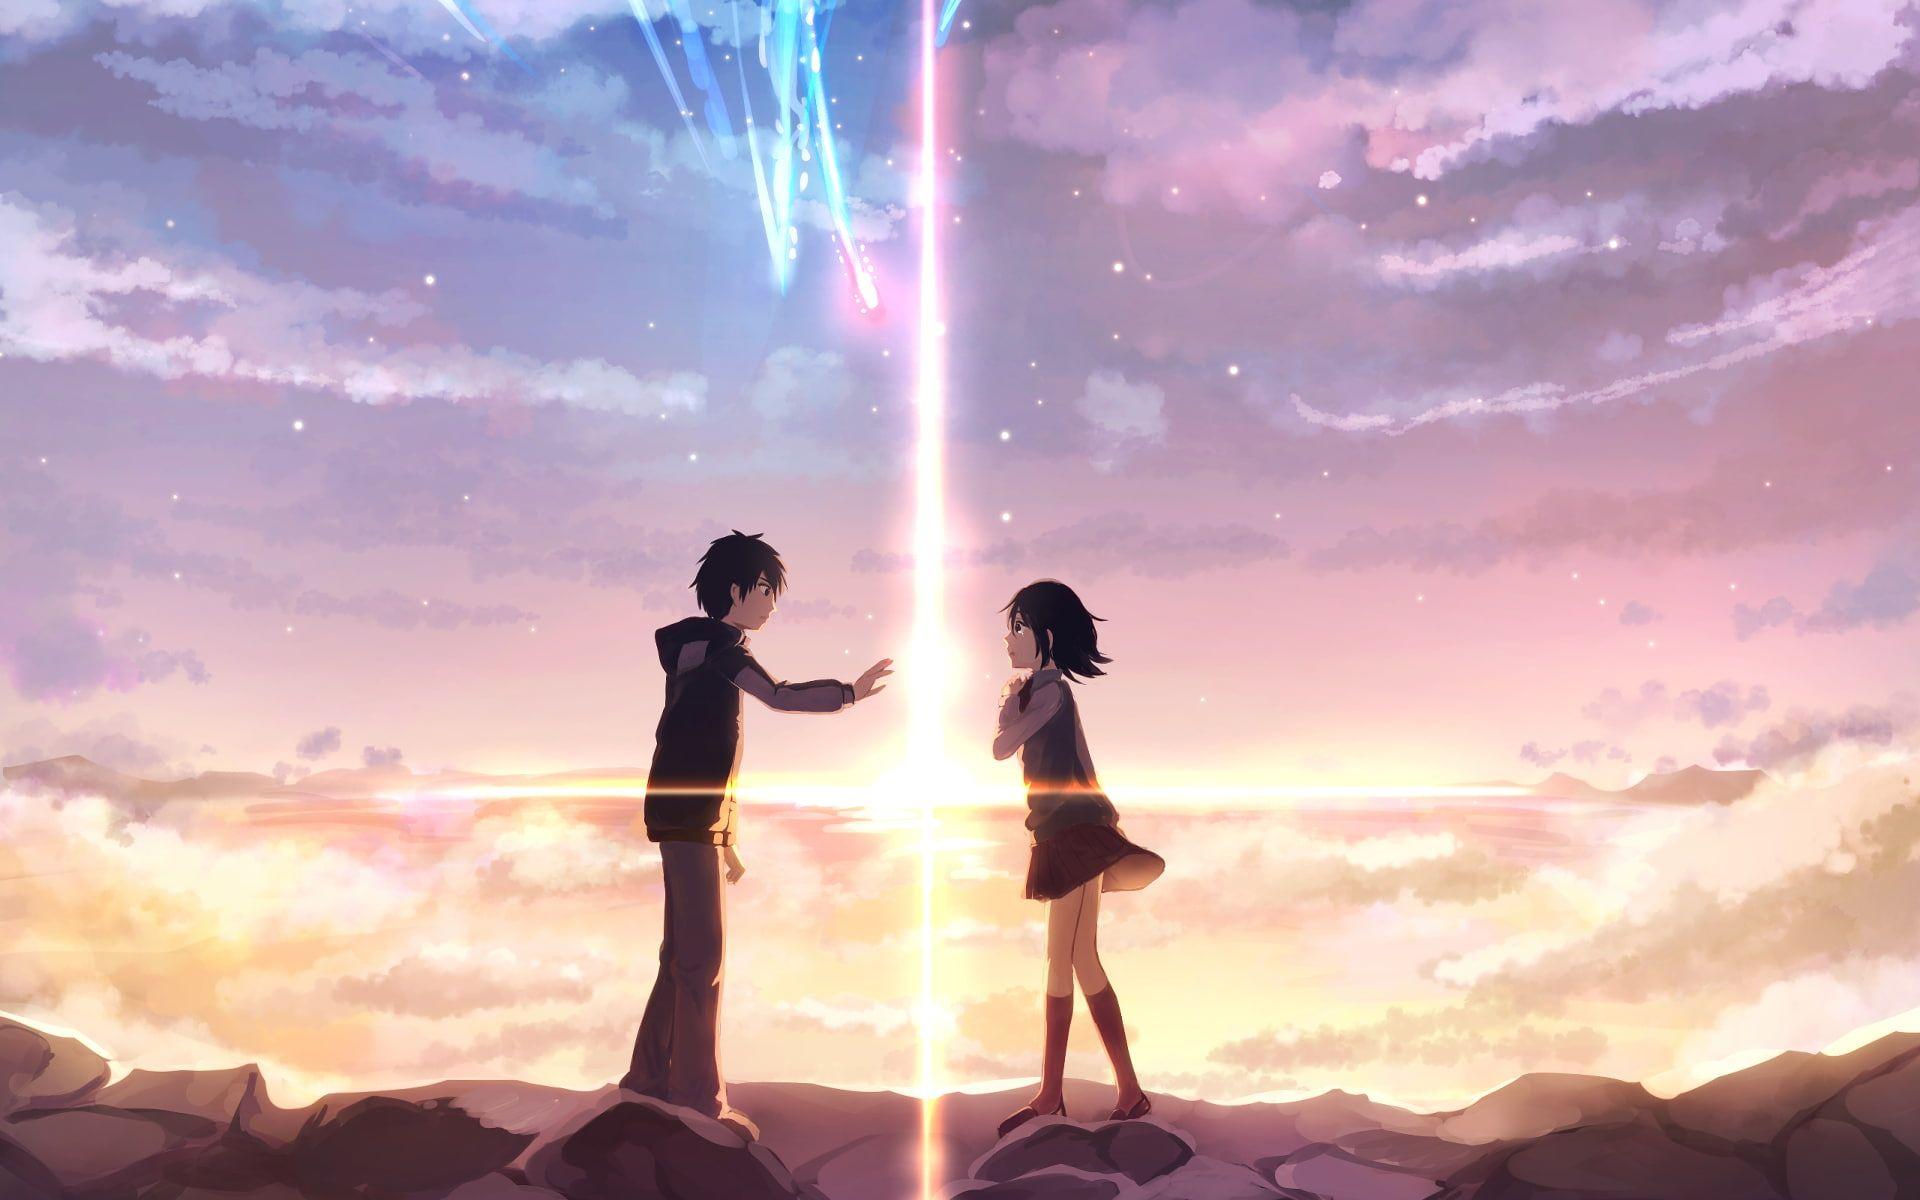 Tachibana Taki Anime Miyamizu Mitsuha Kimi No Na Wa 1080p Wallpaper Hdwallpaper Desktop In 2020 Your Name Anime Kimi No Na Wa Wallpaper Kimi No Na Wa